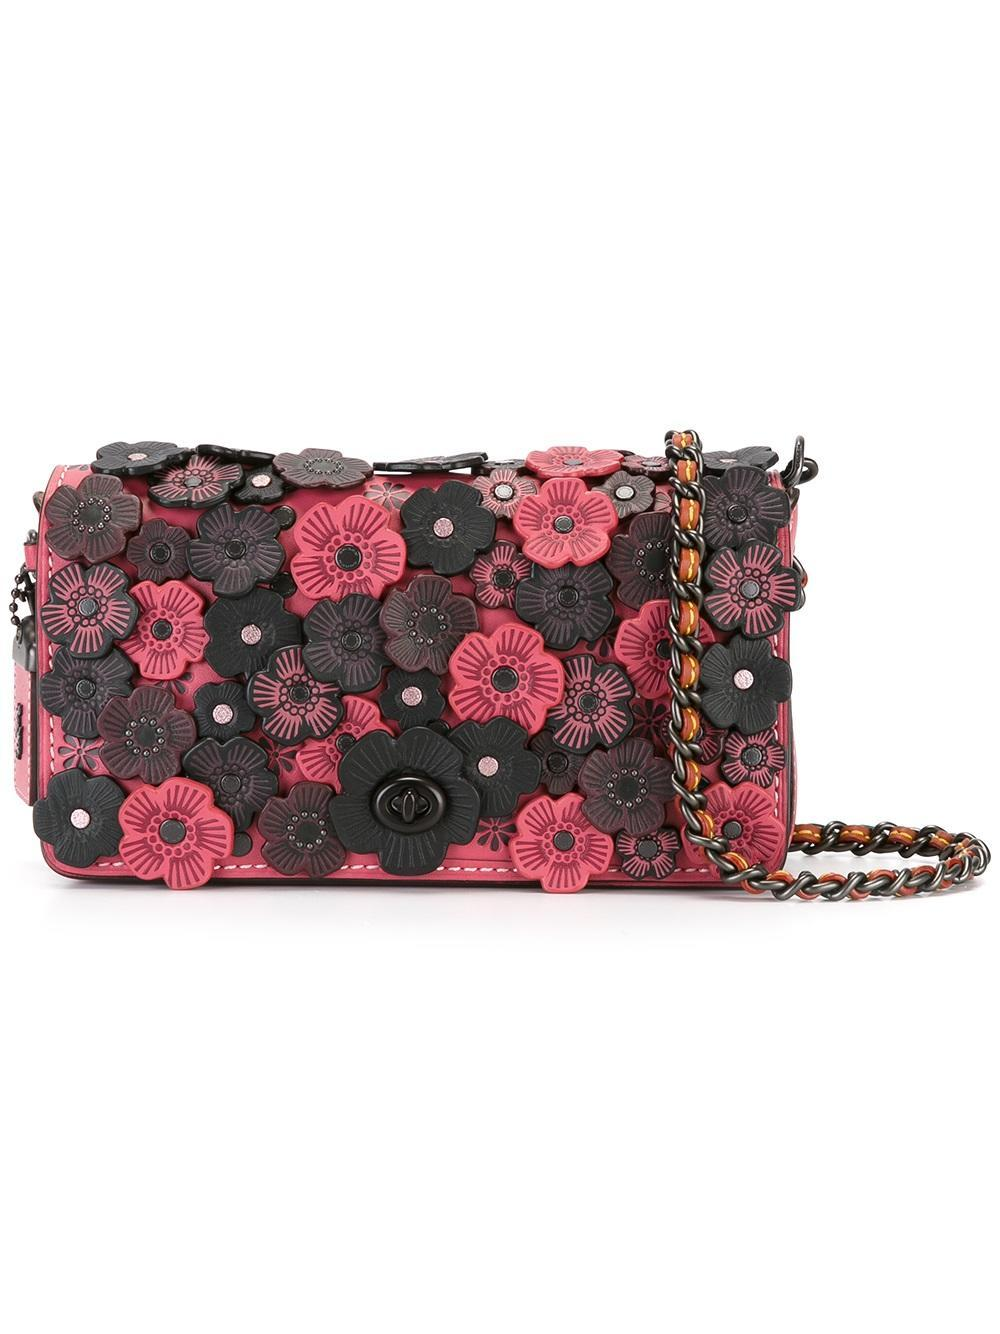 Lyst - Coach Flower Embellished Crossbody Bag In Pink